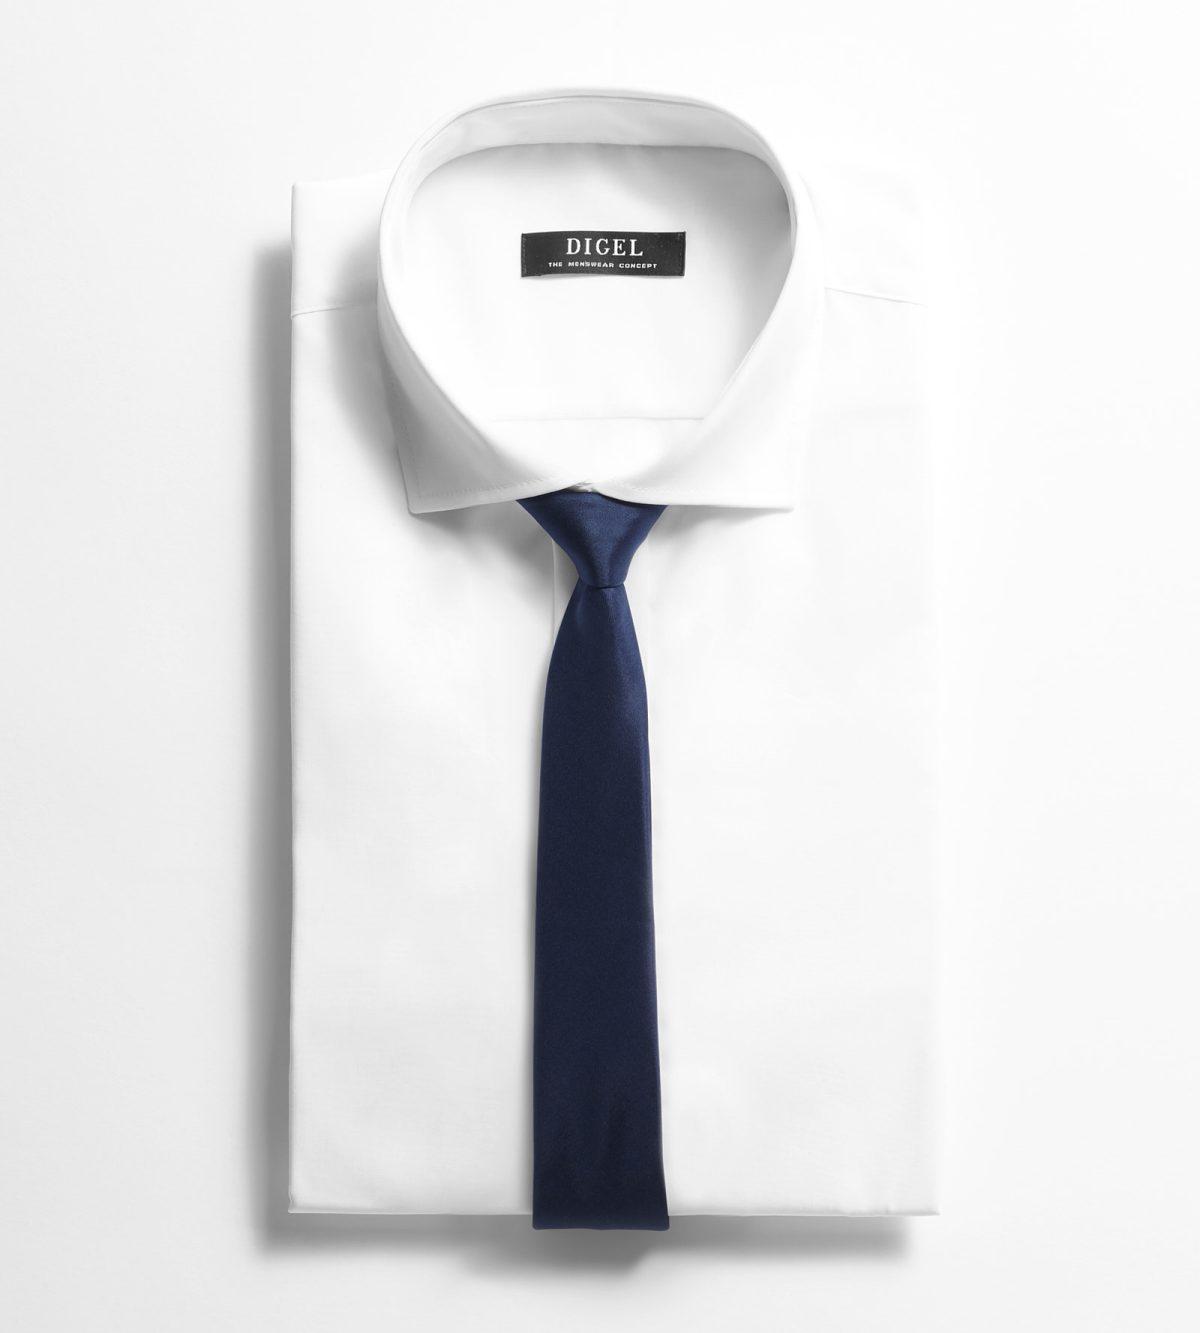 gershwin-sotetkek-selyem-nyakkendo-gershwin-1001601-20-01.jpg